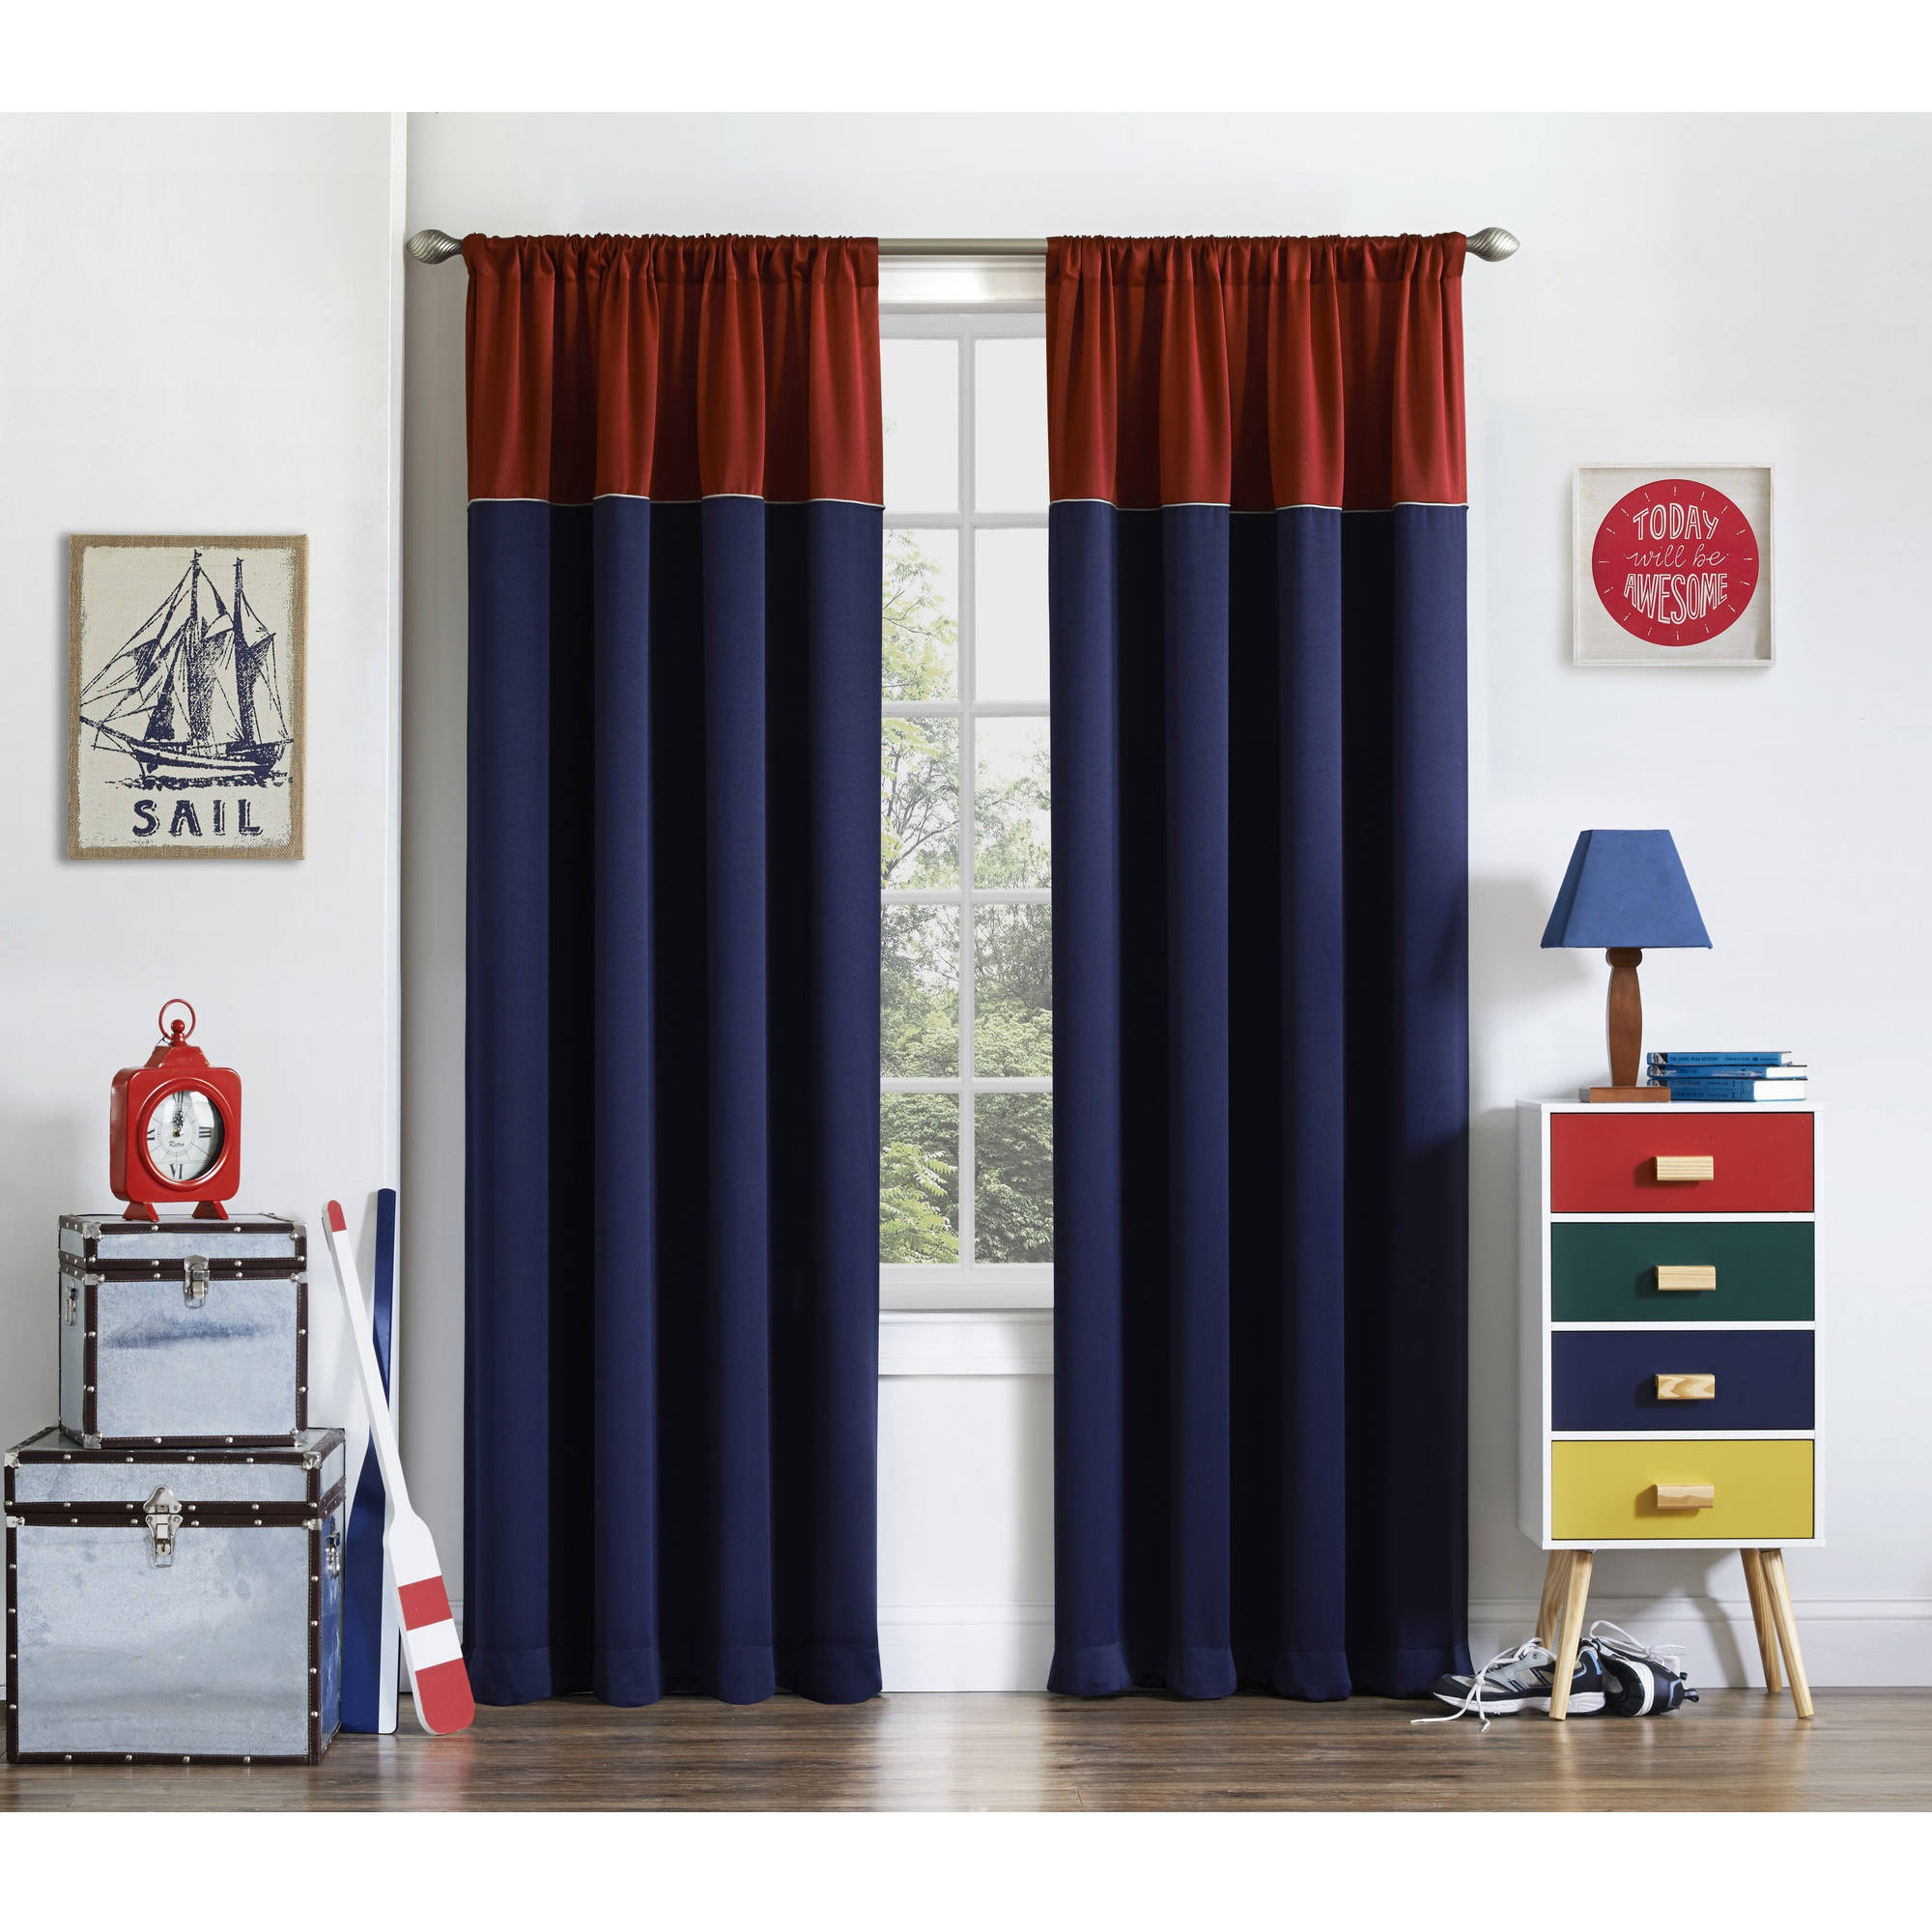 Bedroom Curtains Walmart: Eclipse Luna Room Darkening Kids Bedroom Curtain